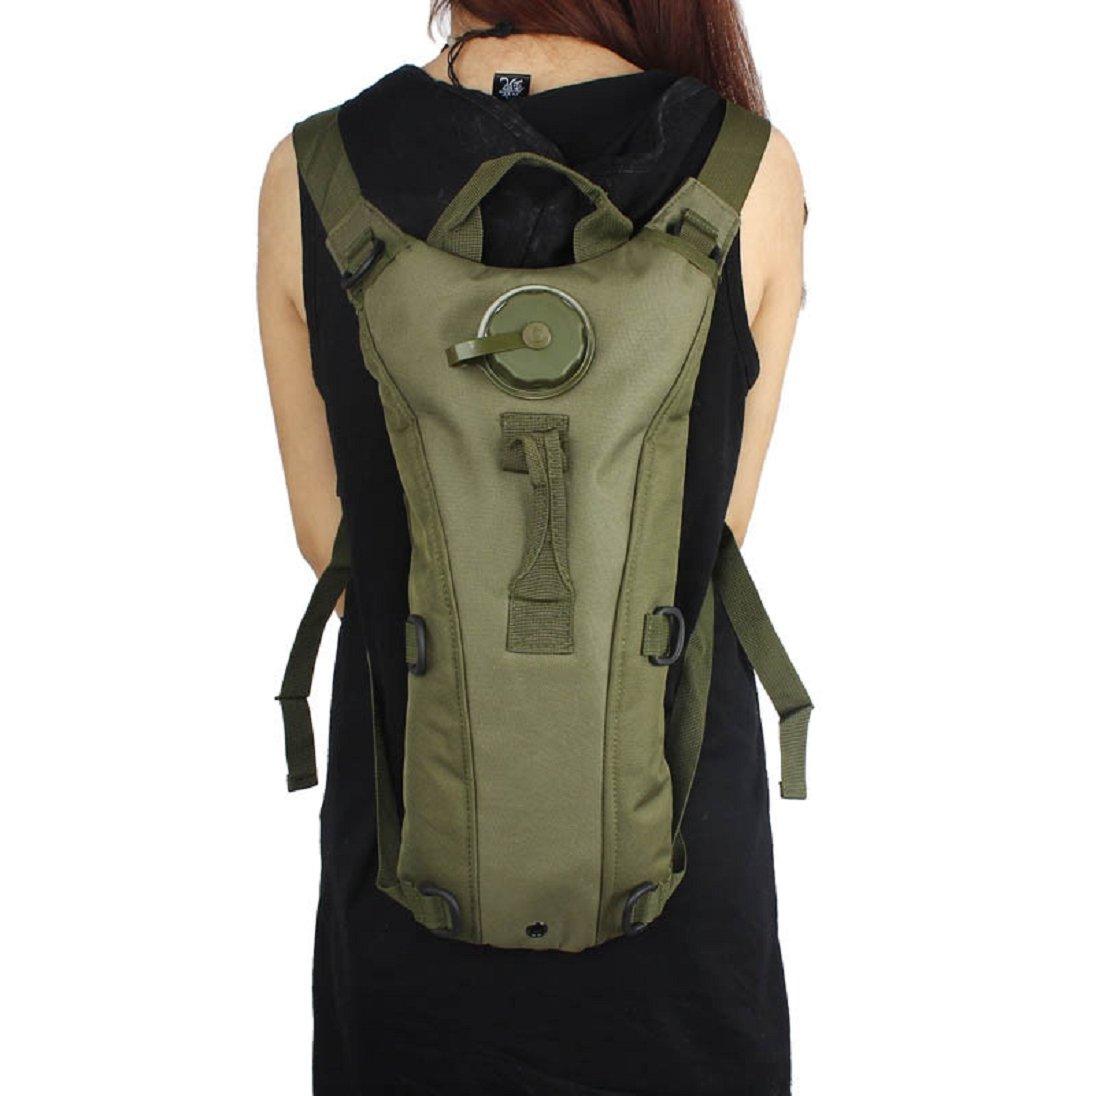 AutumnFall ®水和システム水バッグポーチバックパック膀胱ハイキング登山サバイバル3l  C B0140T8DF0